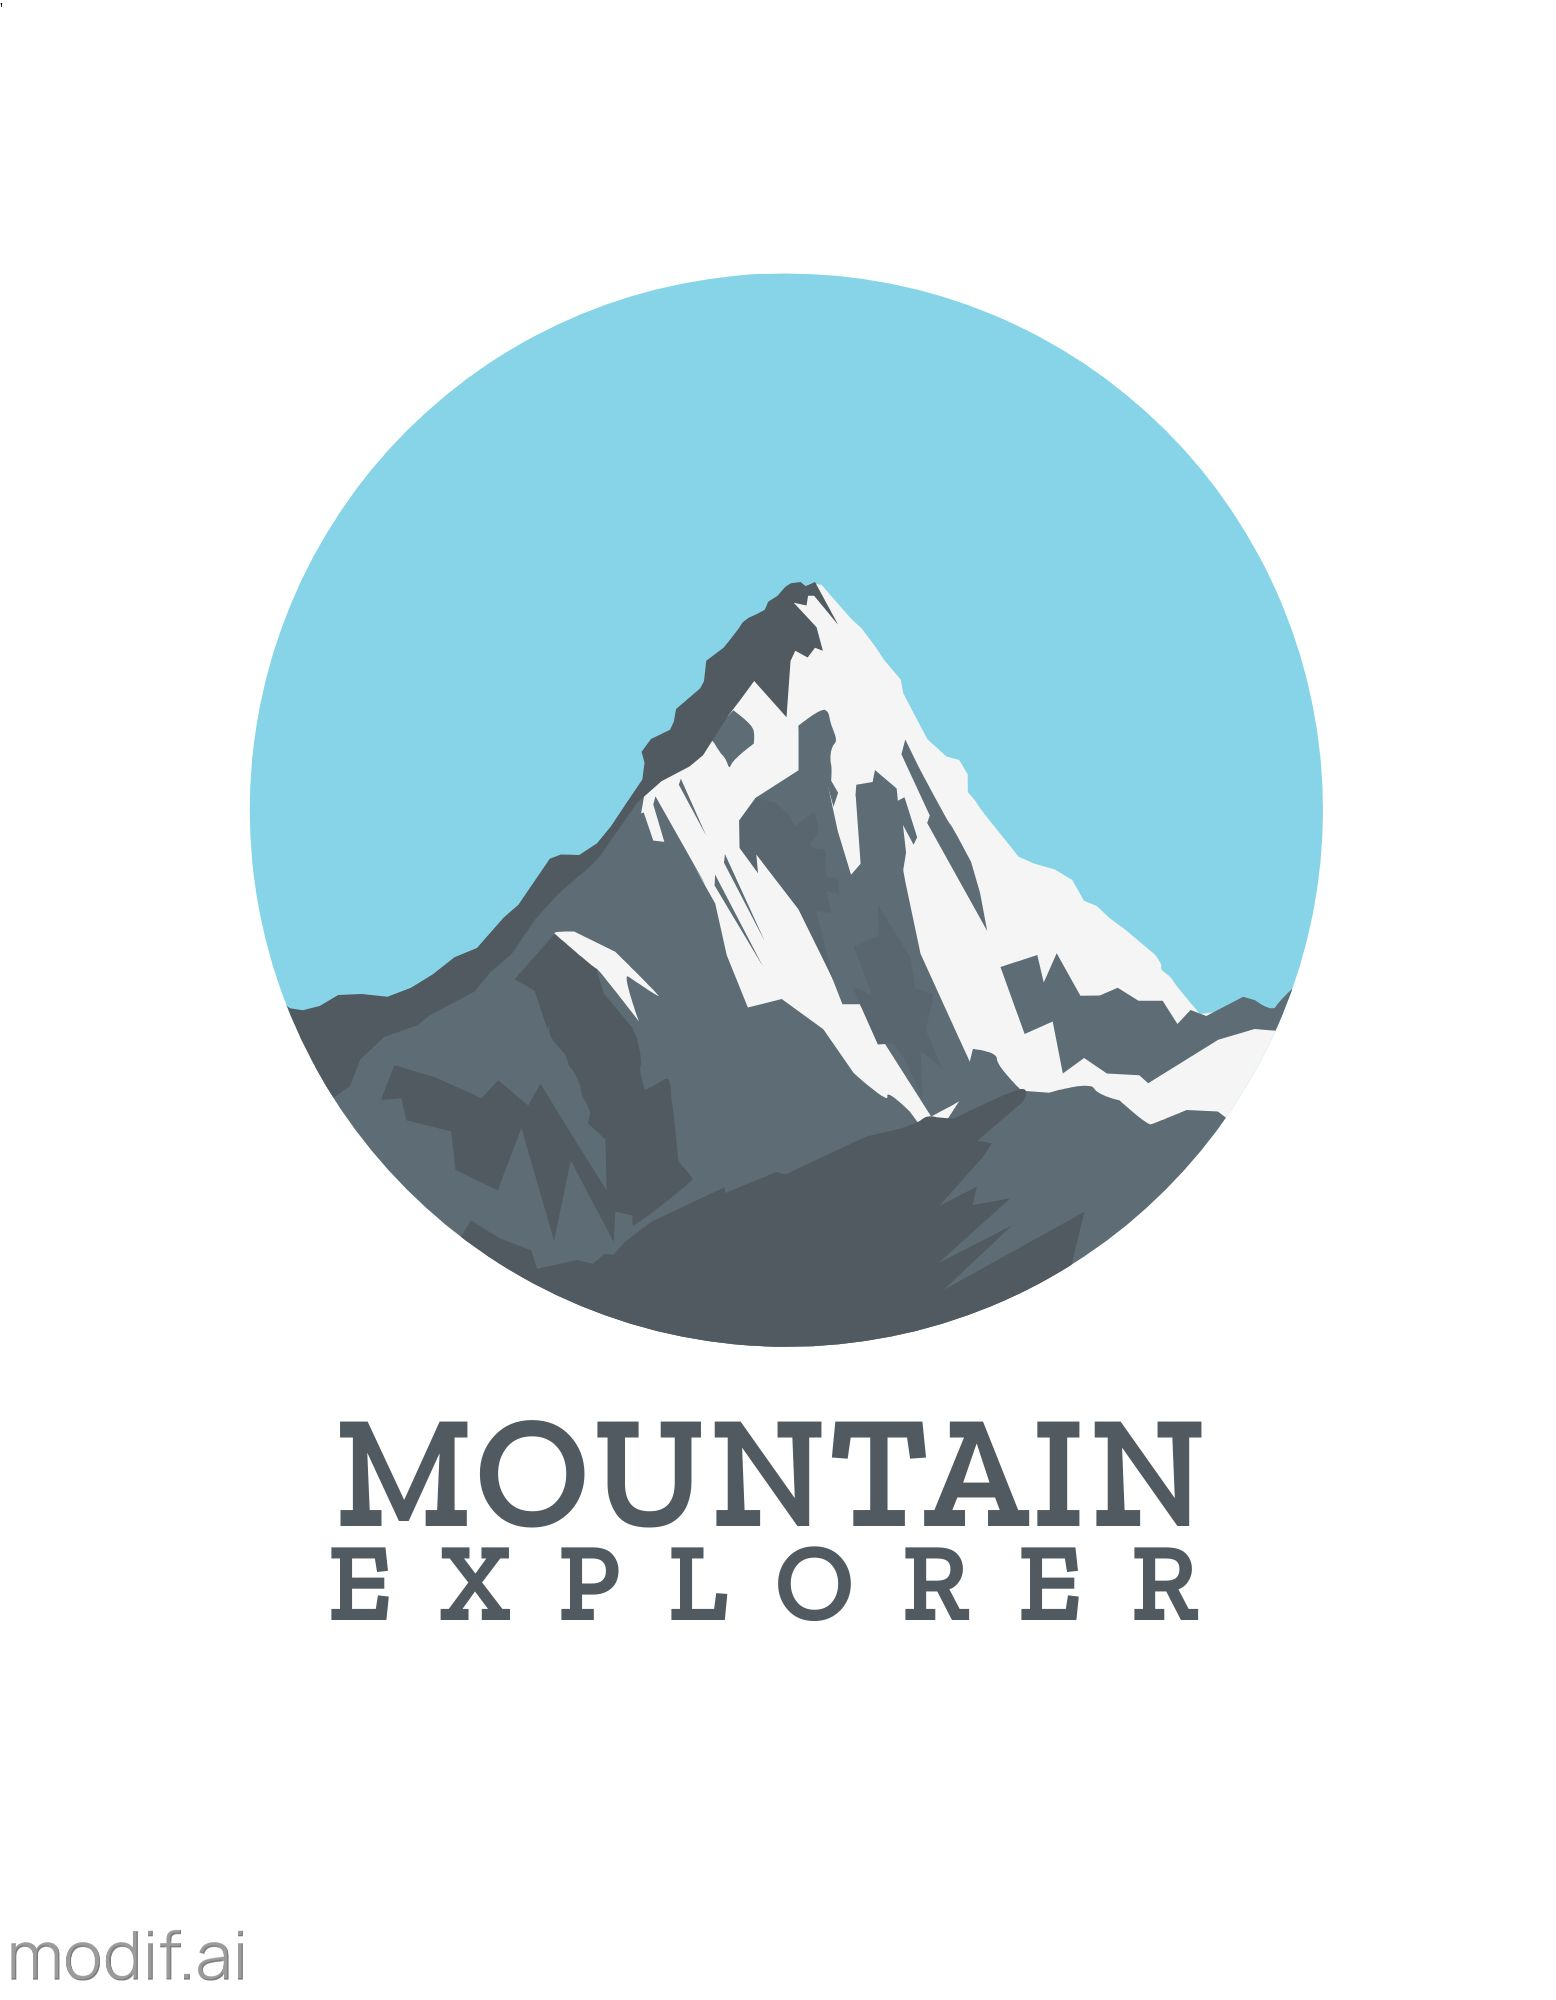 Mountain Exploration T-Shirt Design Template